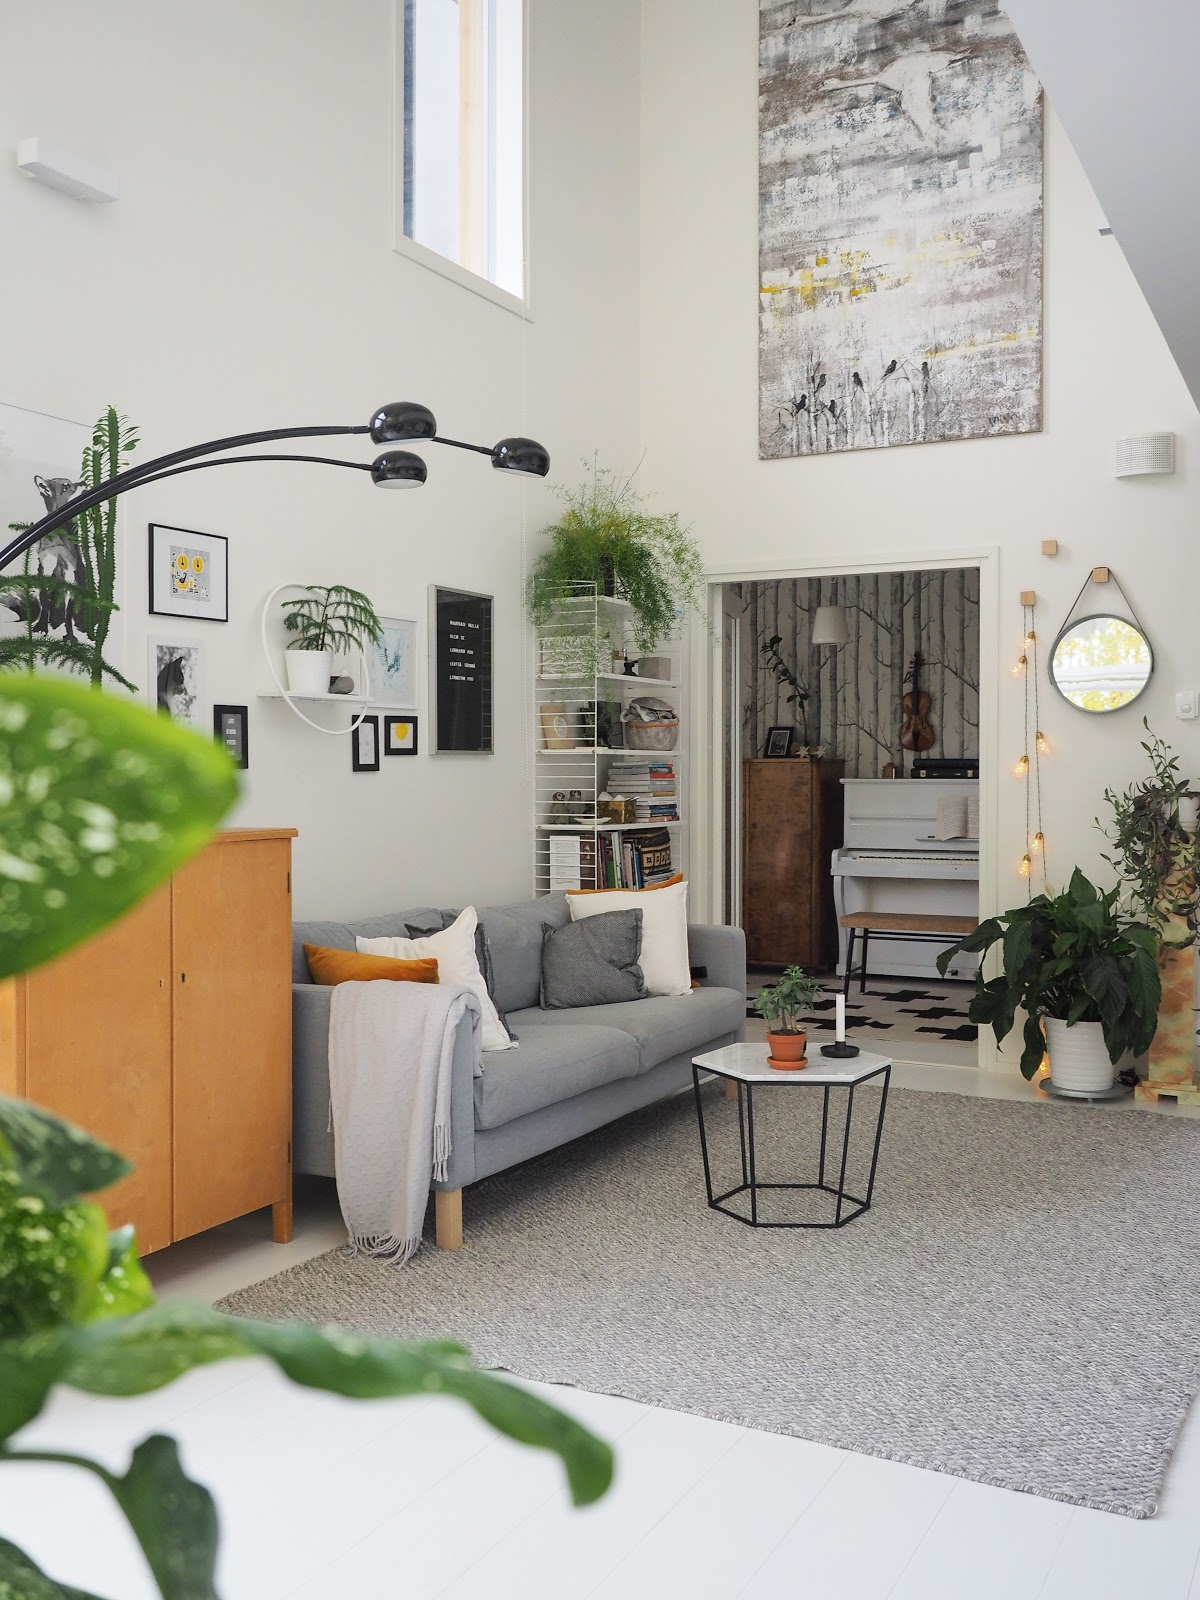 Linie Design, Caldo, olohuone, livingroom